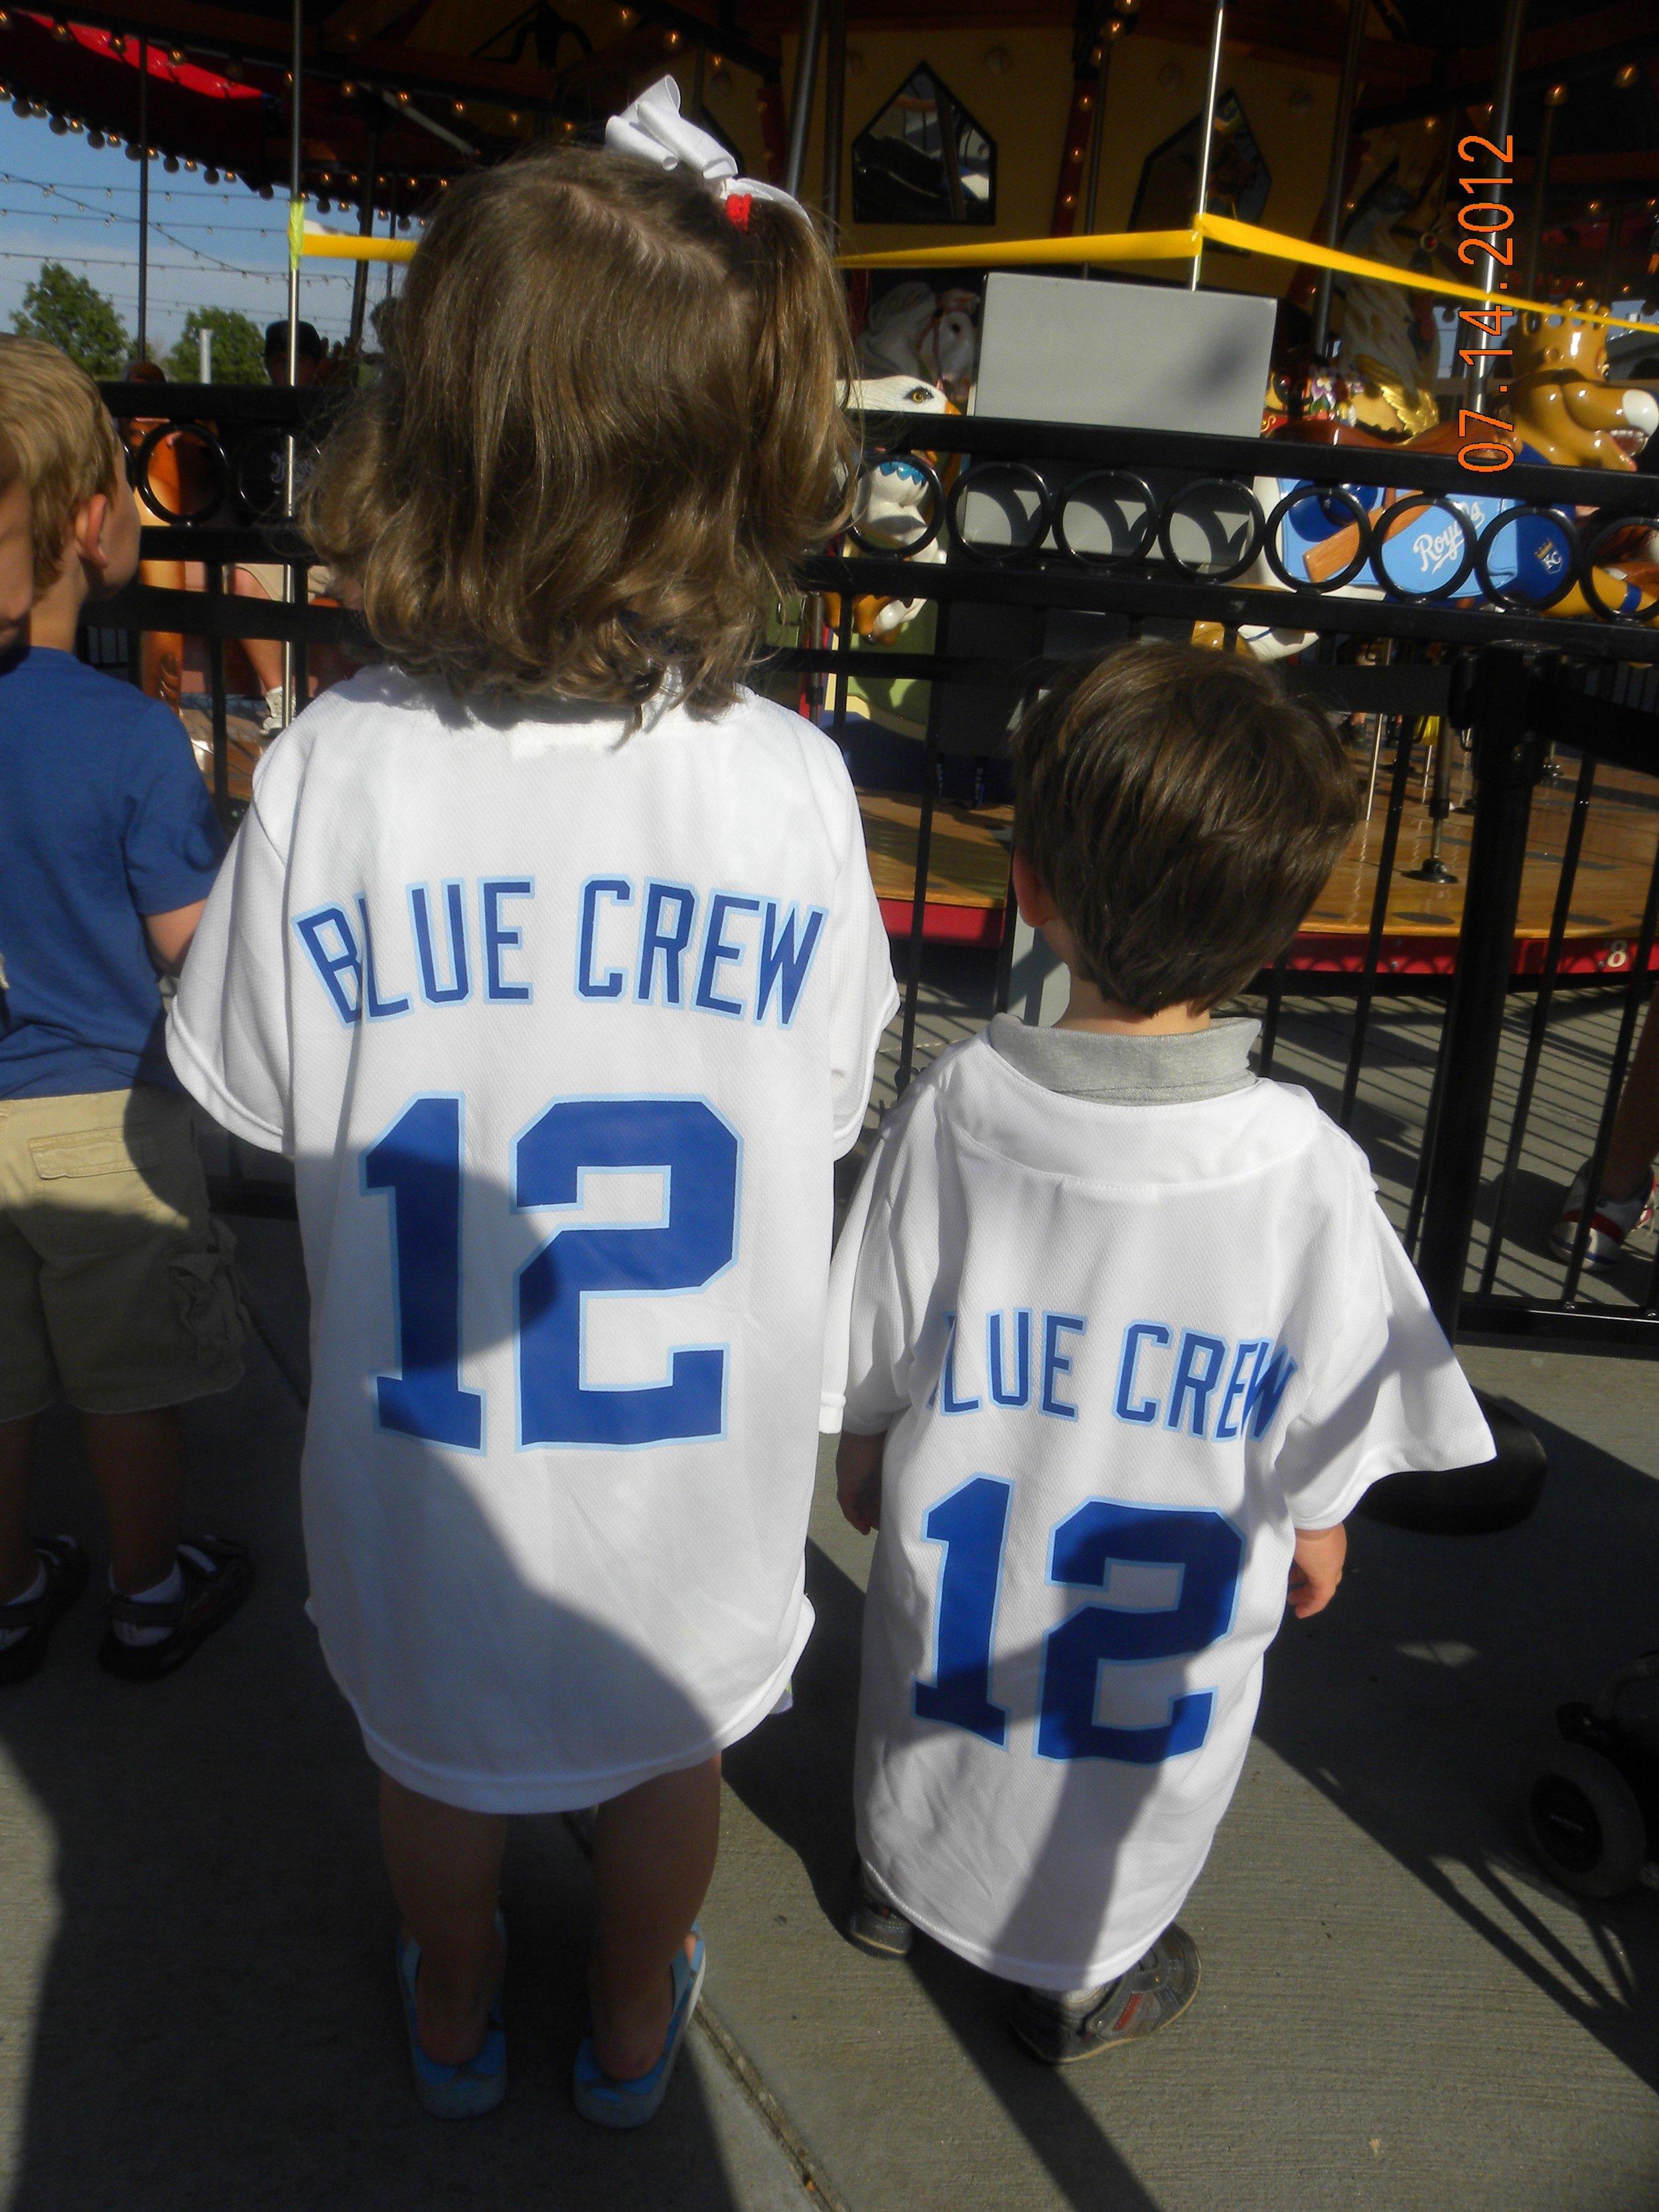 Our children joined the Sluggerrr's Blue Crew in Kansas City.